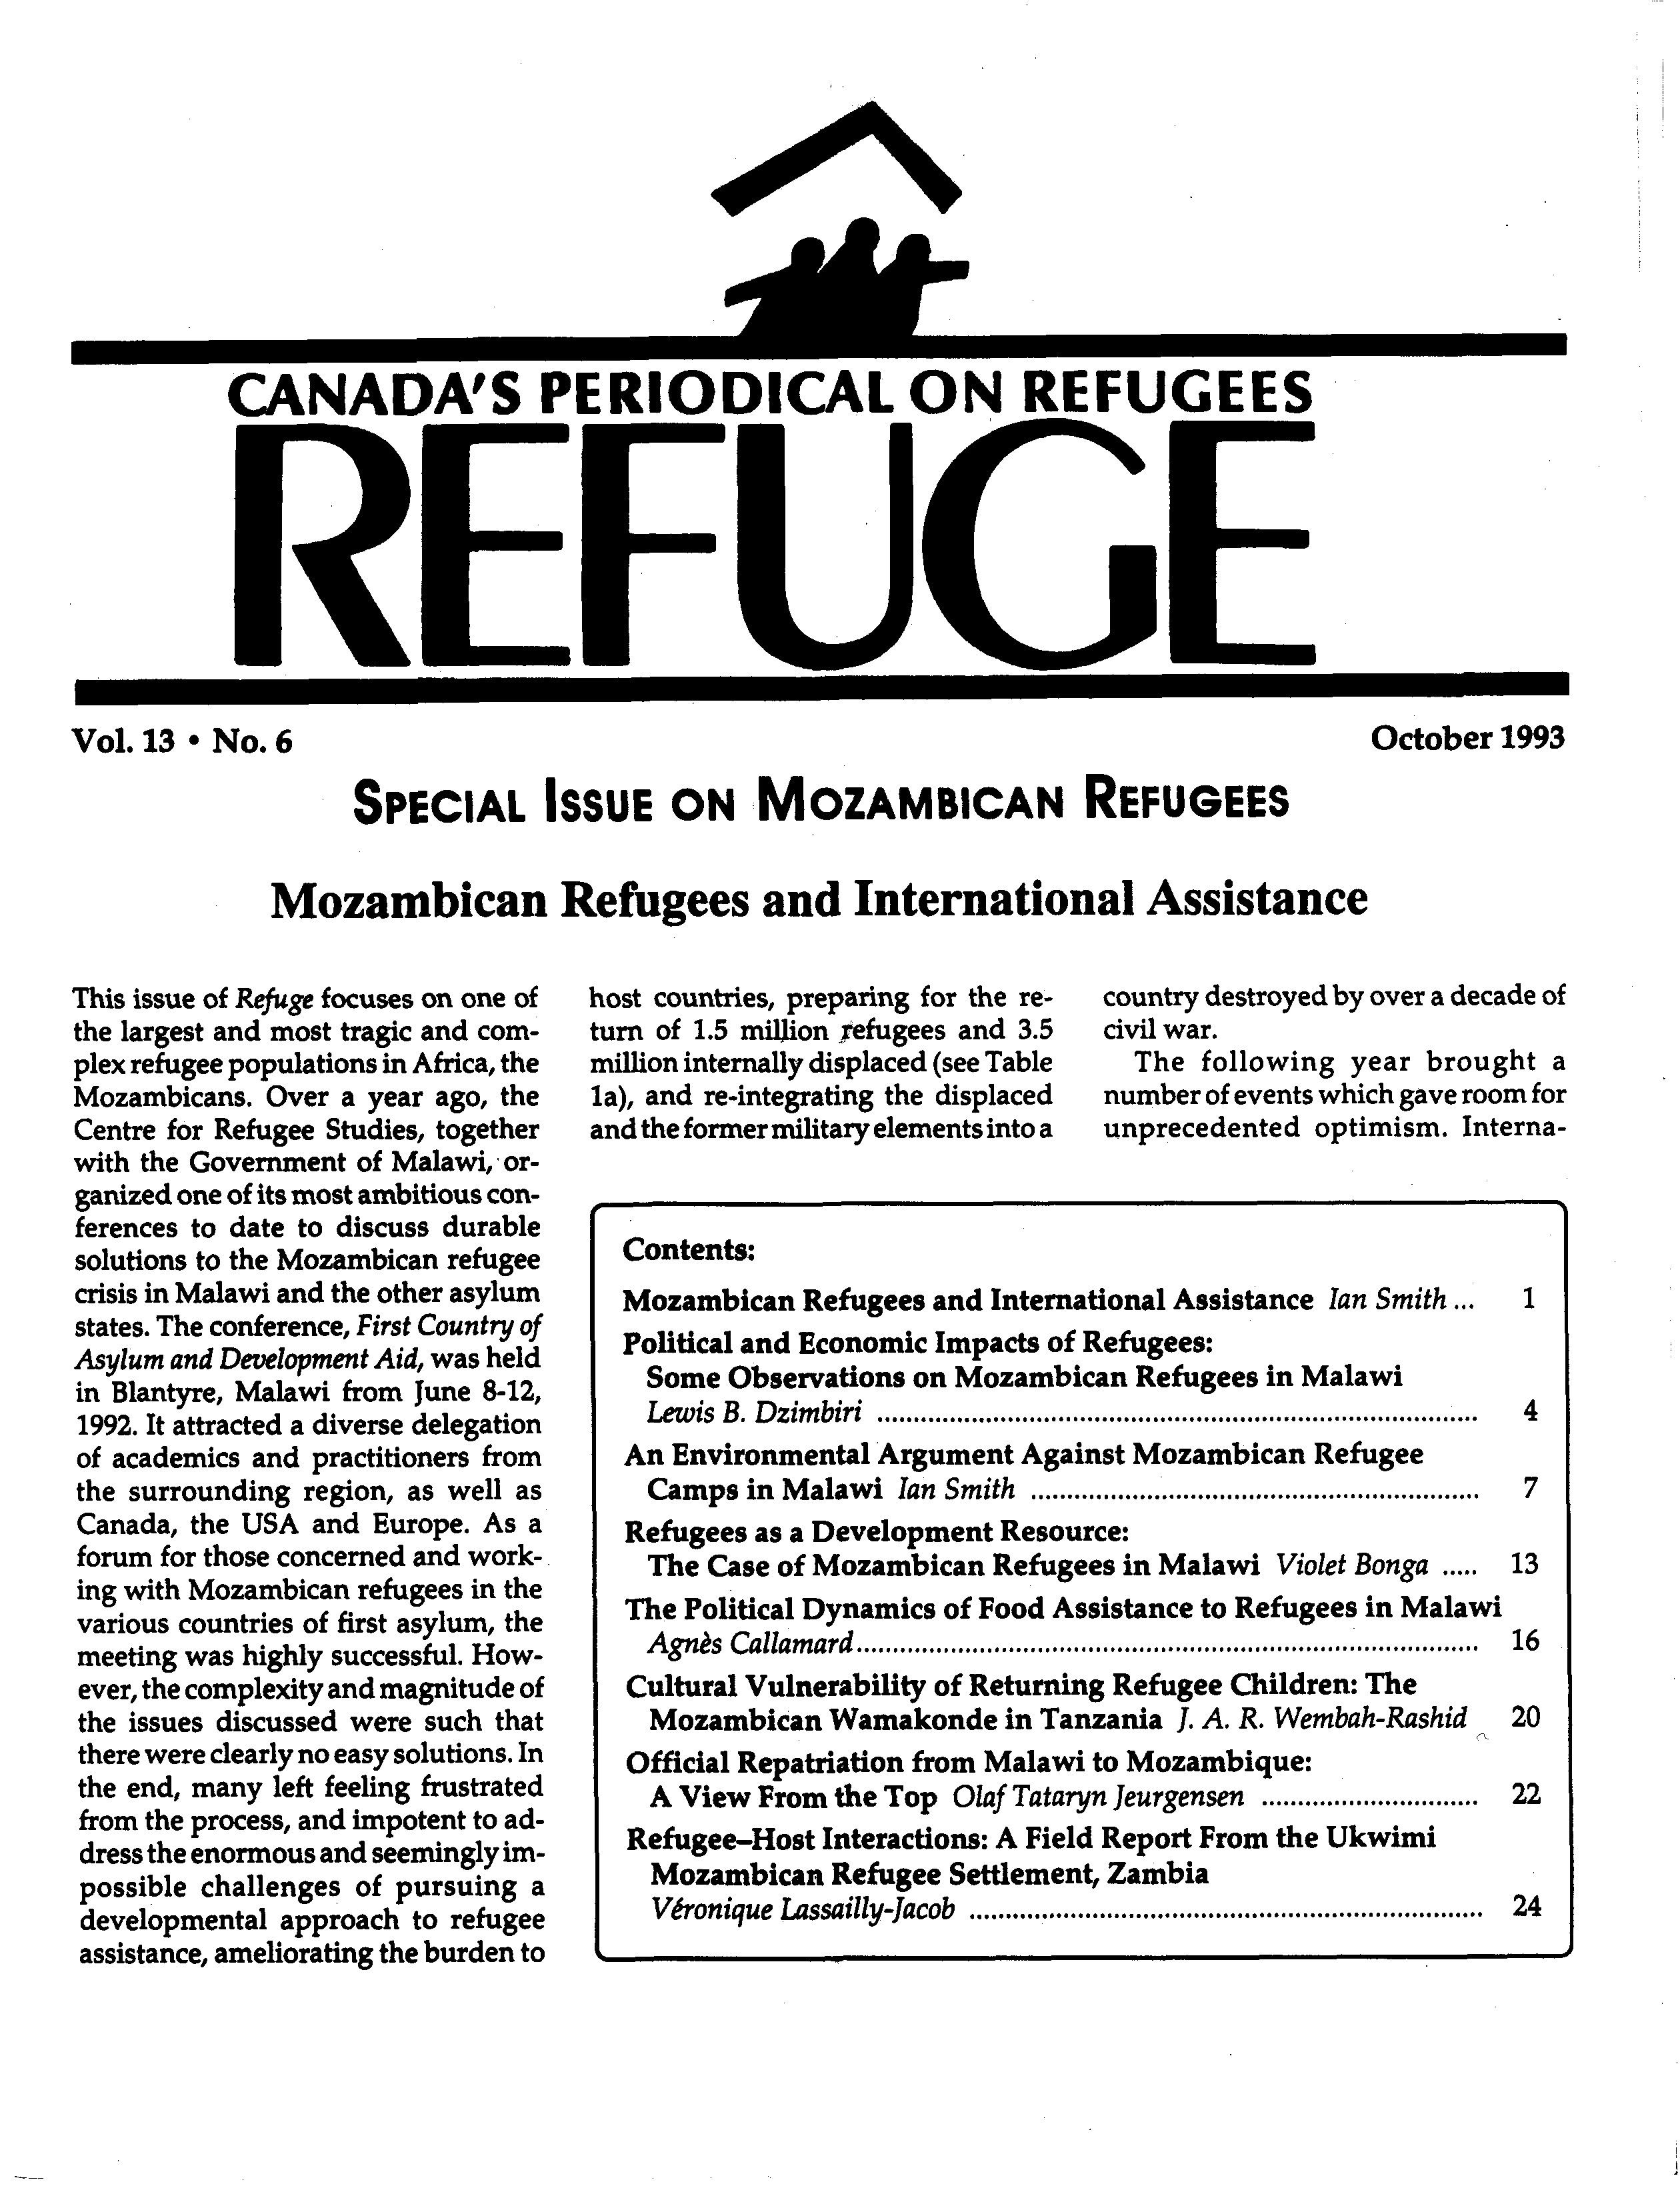 first page Refuge vol. 13.6 1993